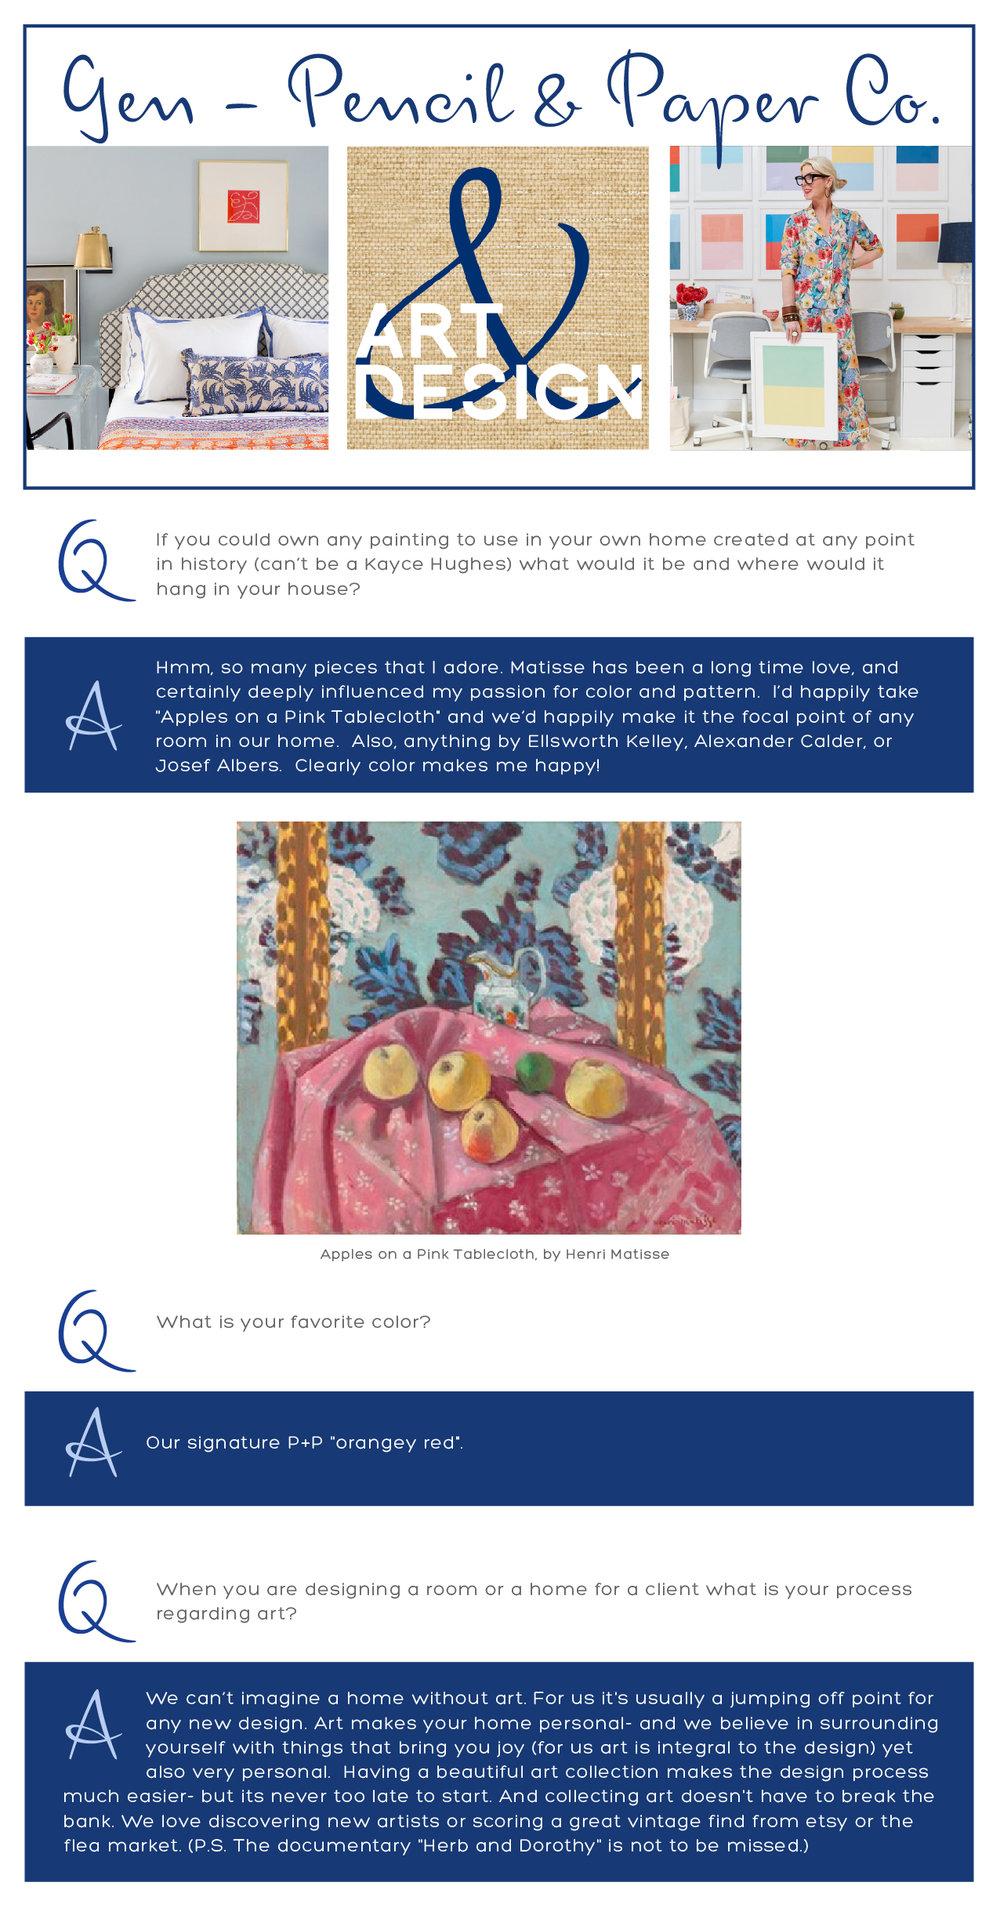 Art & Design Series - Gen Sohr-02.jpg